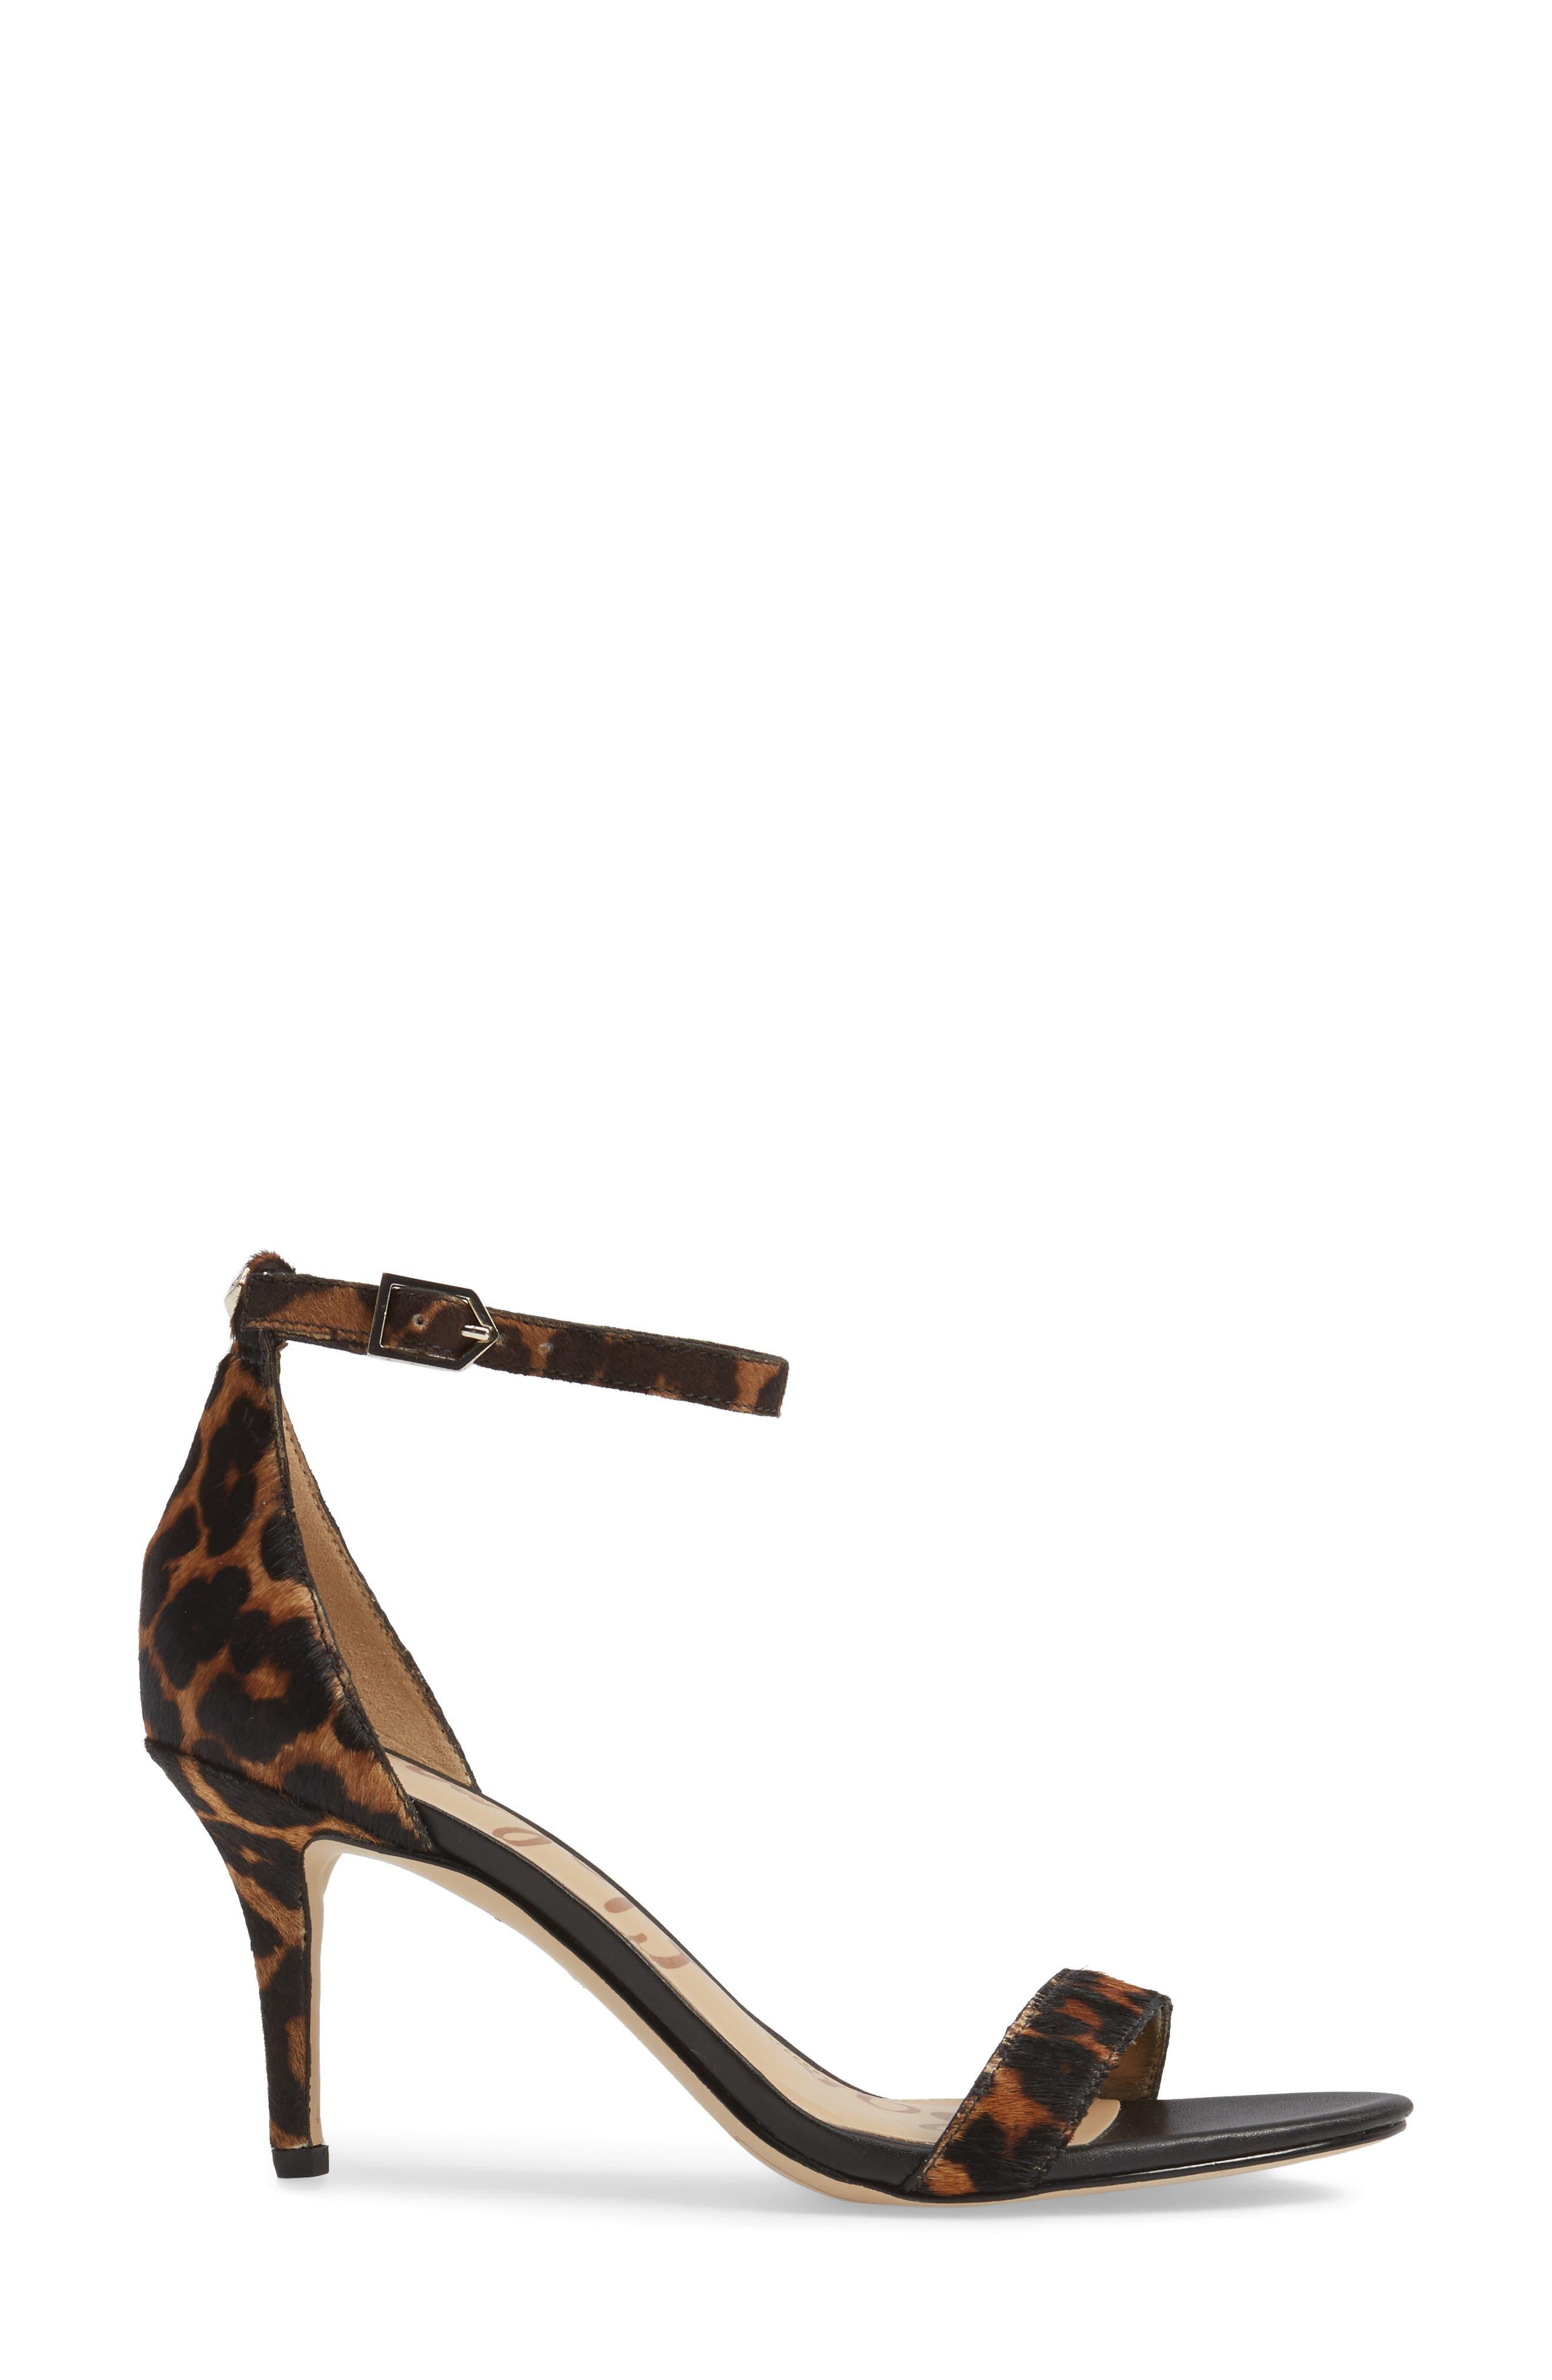 ,                             'Patti' Ankle Strap Sandal,                             Alternate thumbnail 164, color,                             201